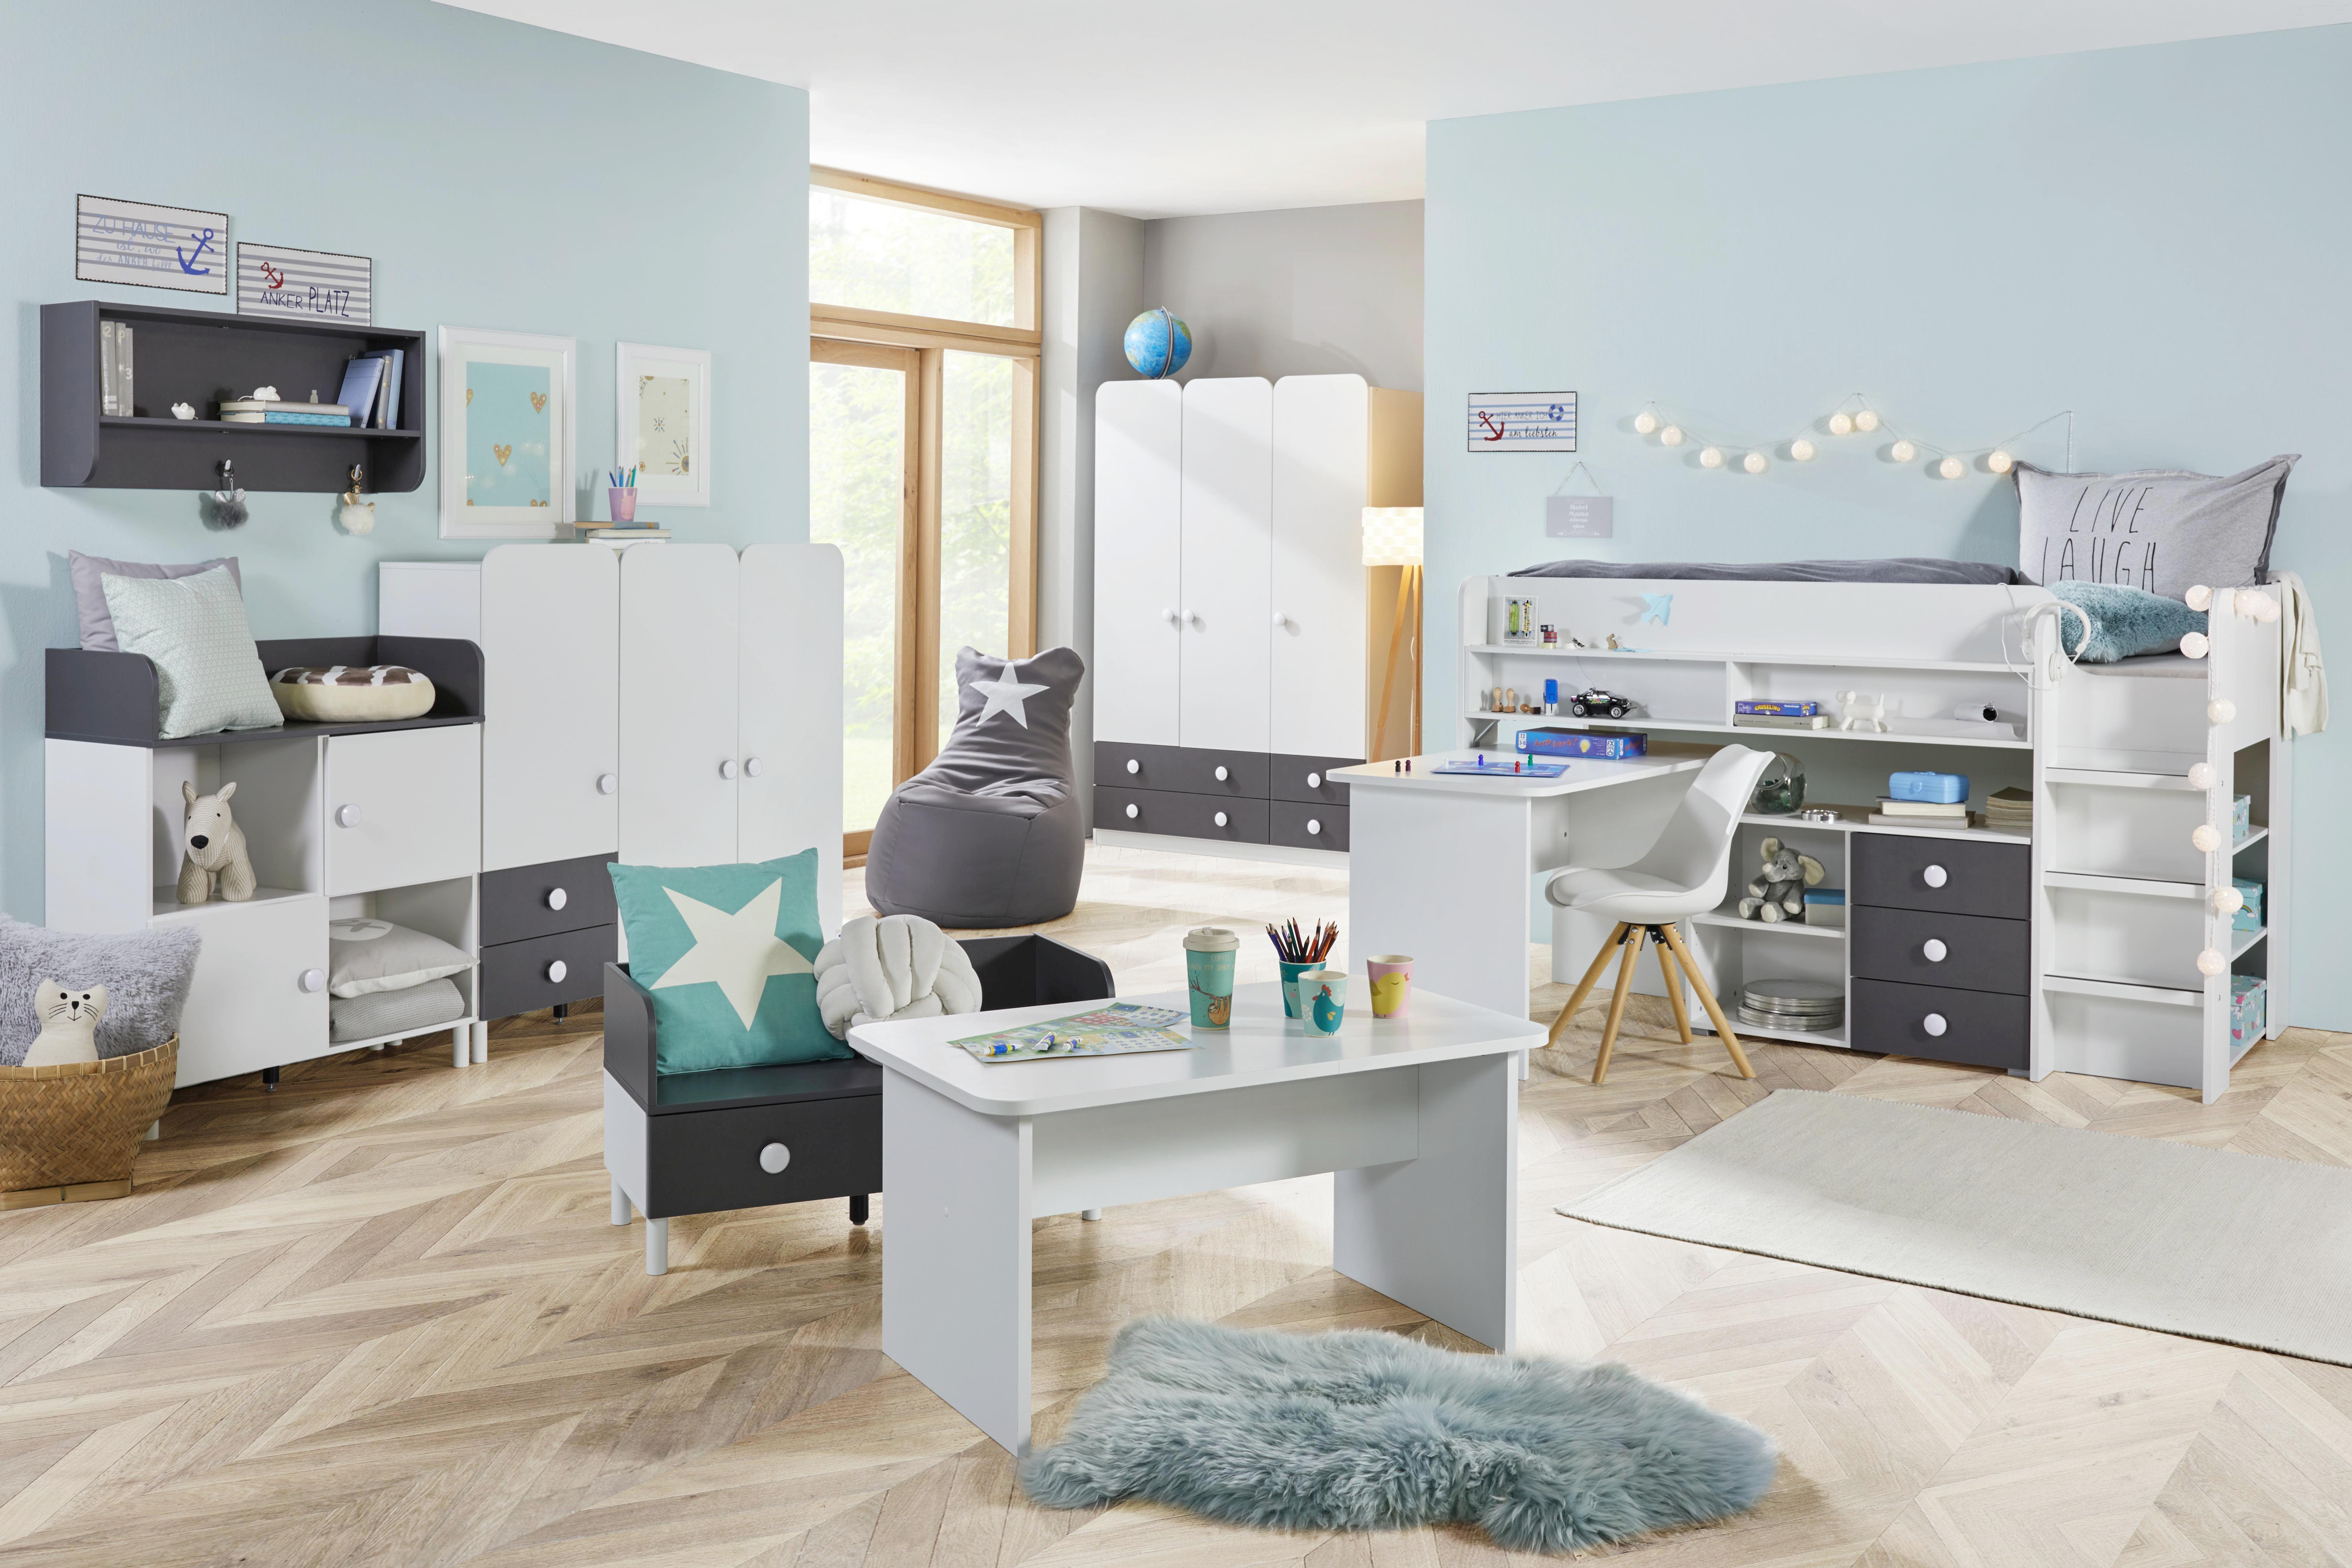 Etagenbett Mit Gitterbett : Etagenbett mit babybett stunning hochbetten fur beste